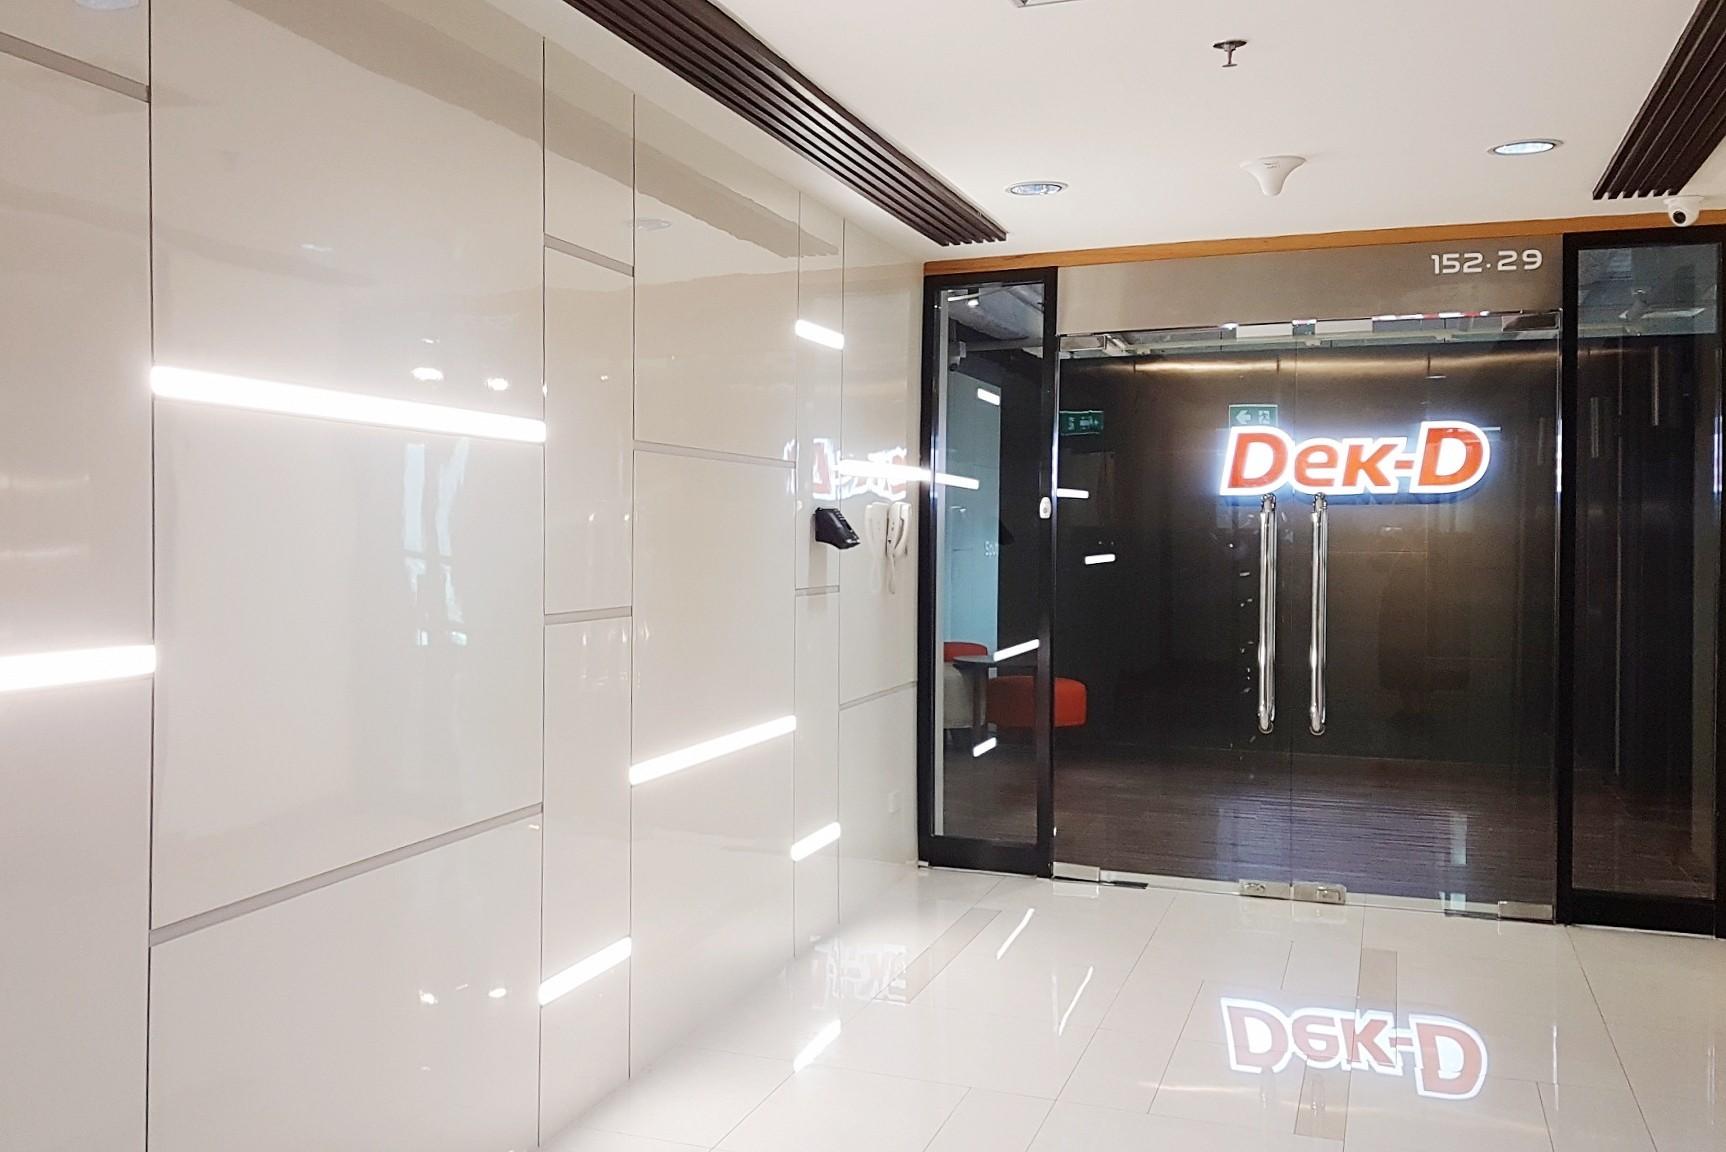 Dek-D